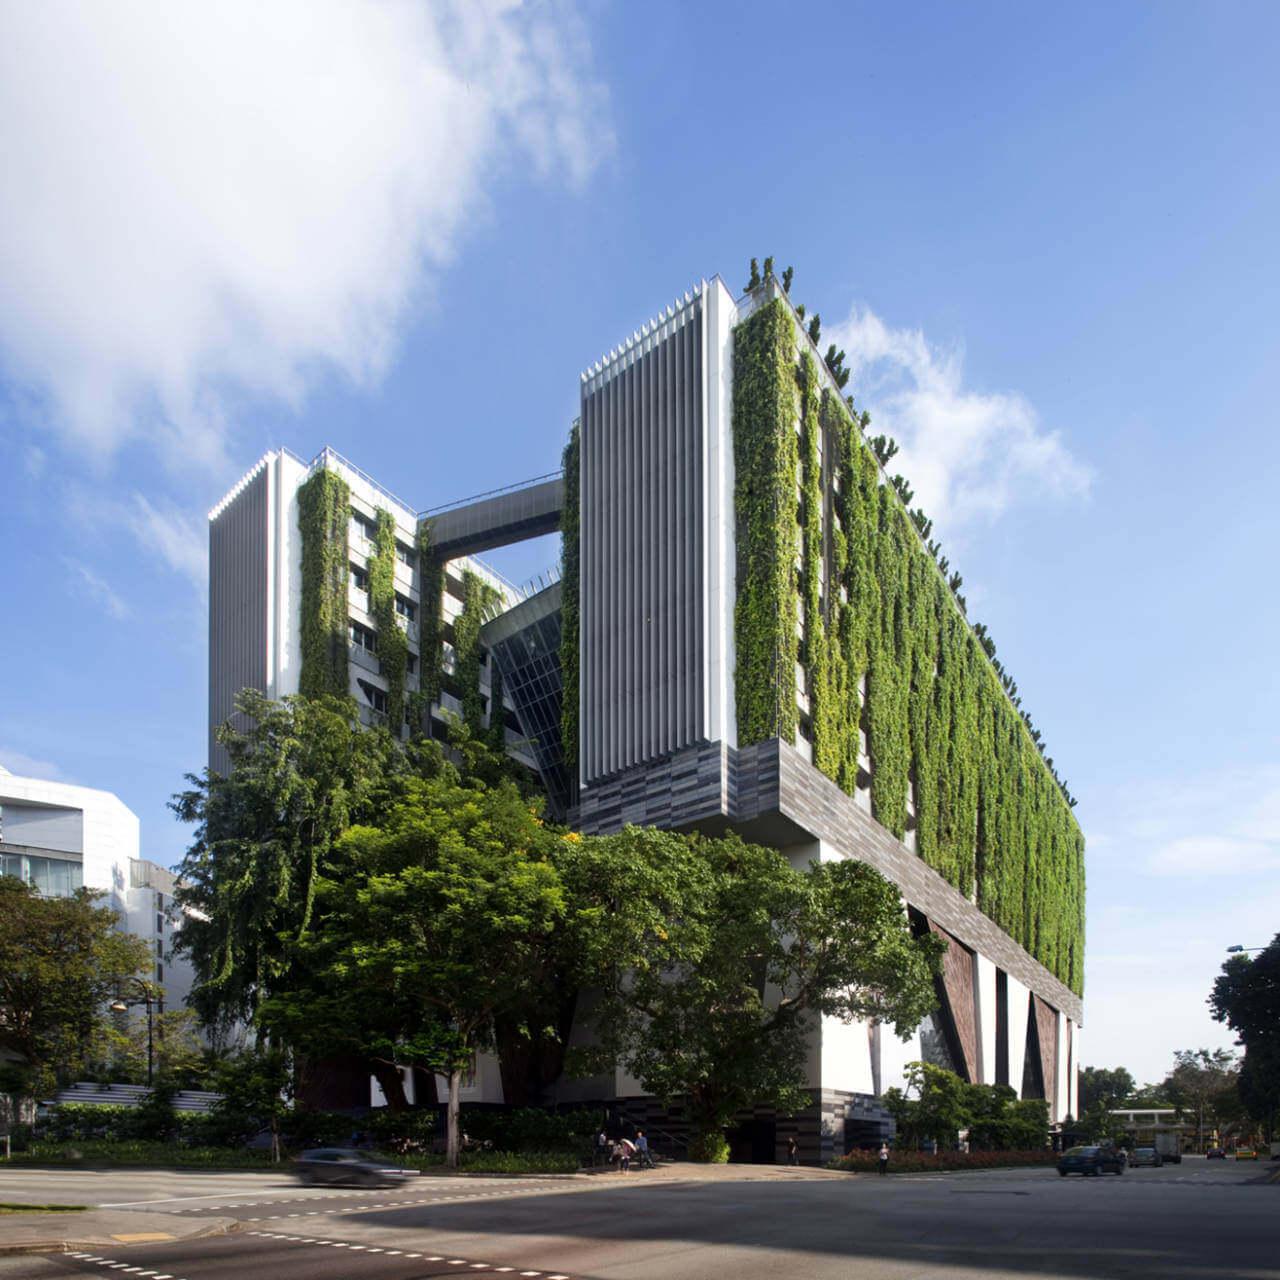 Singapore architecture 9 (1)